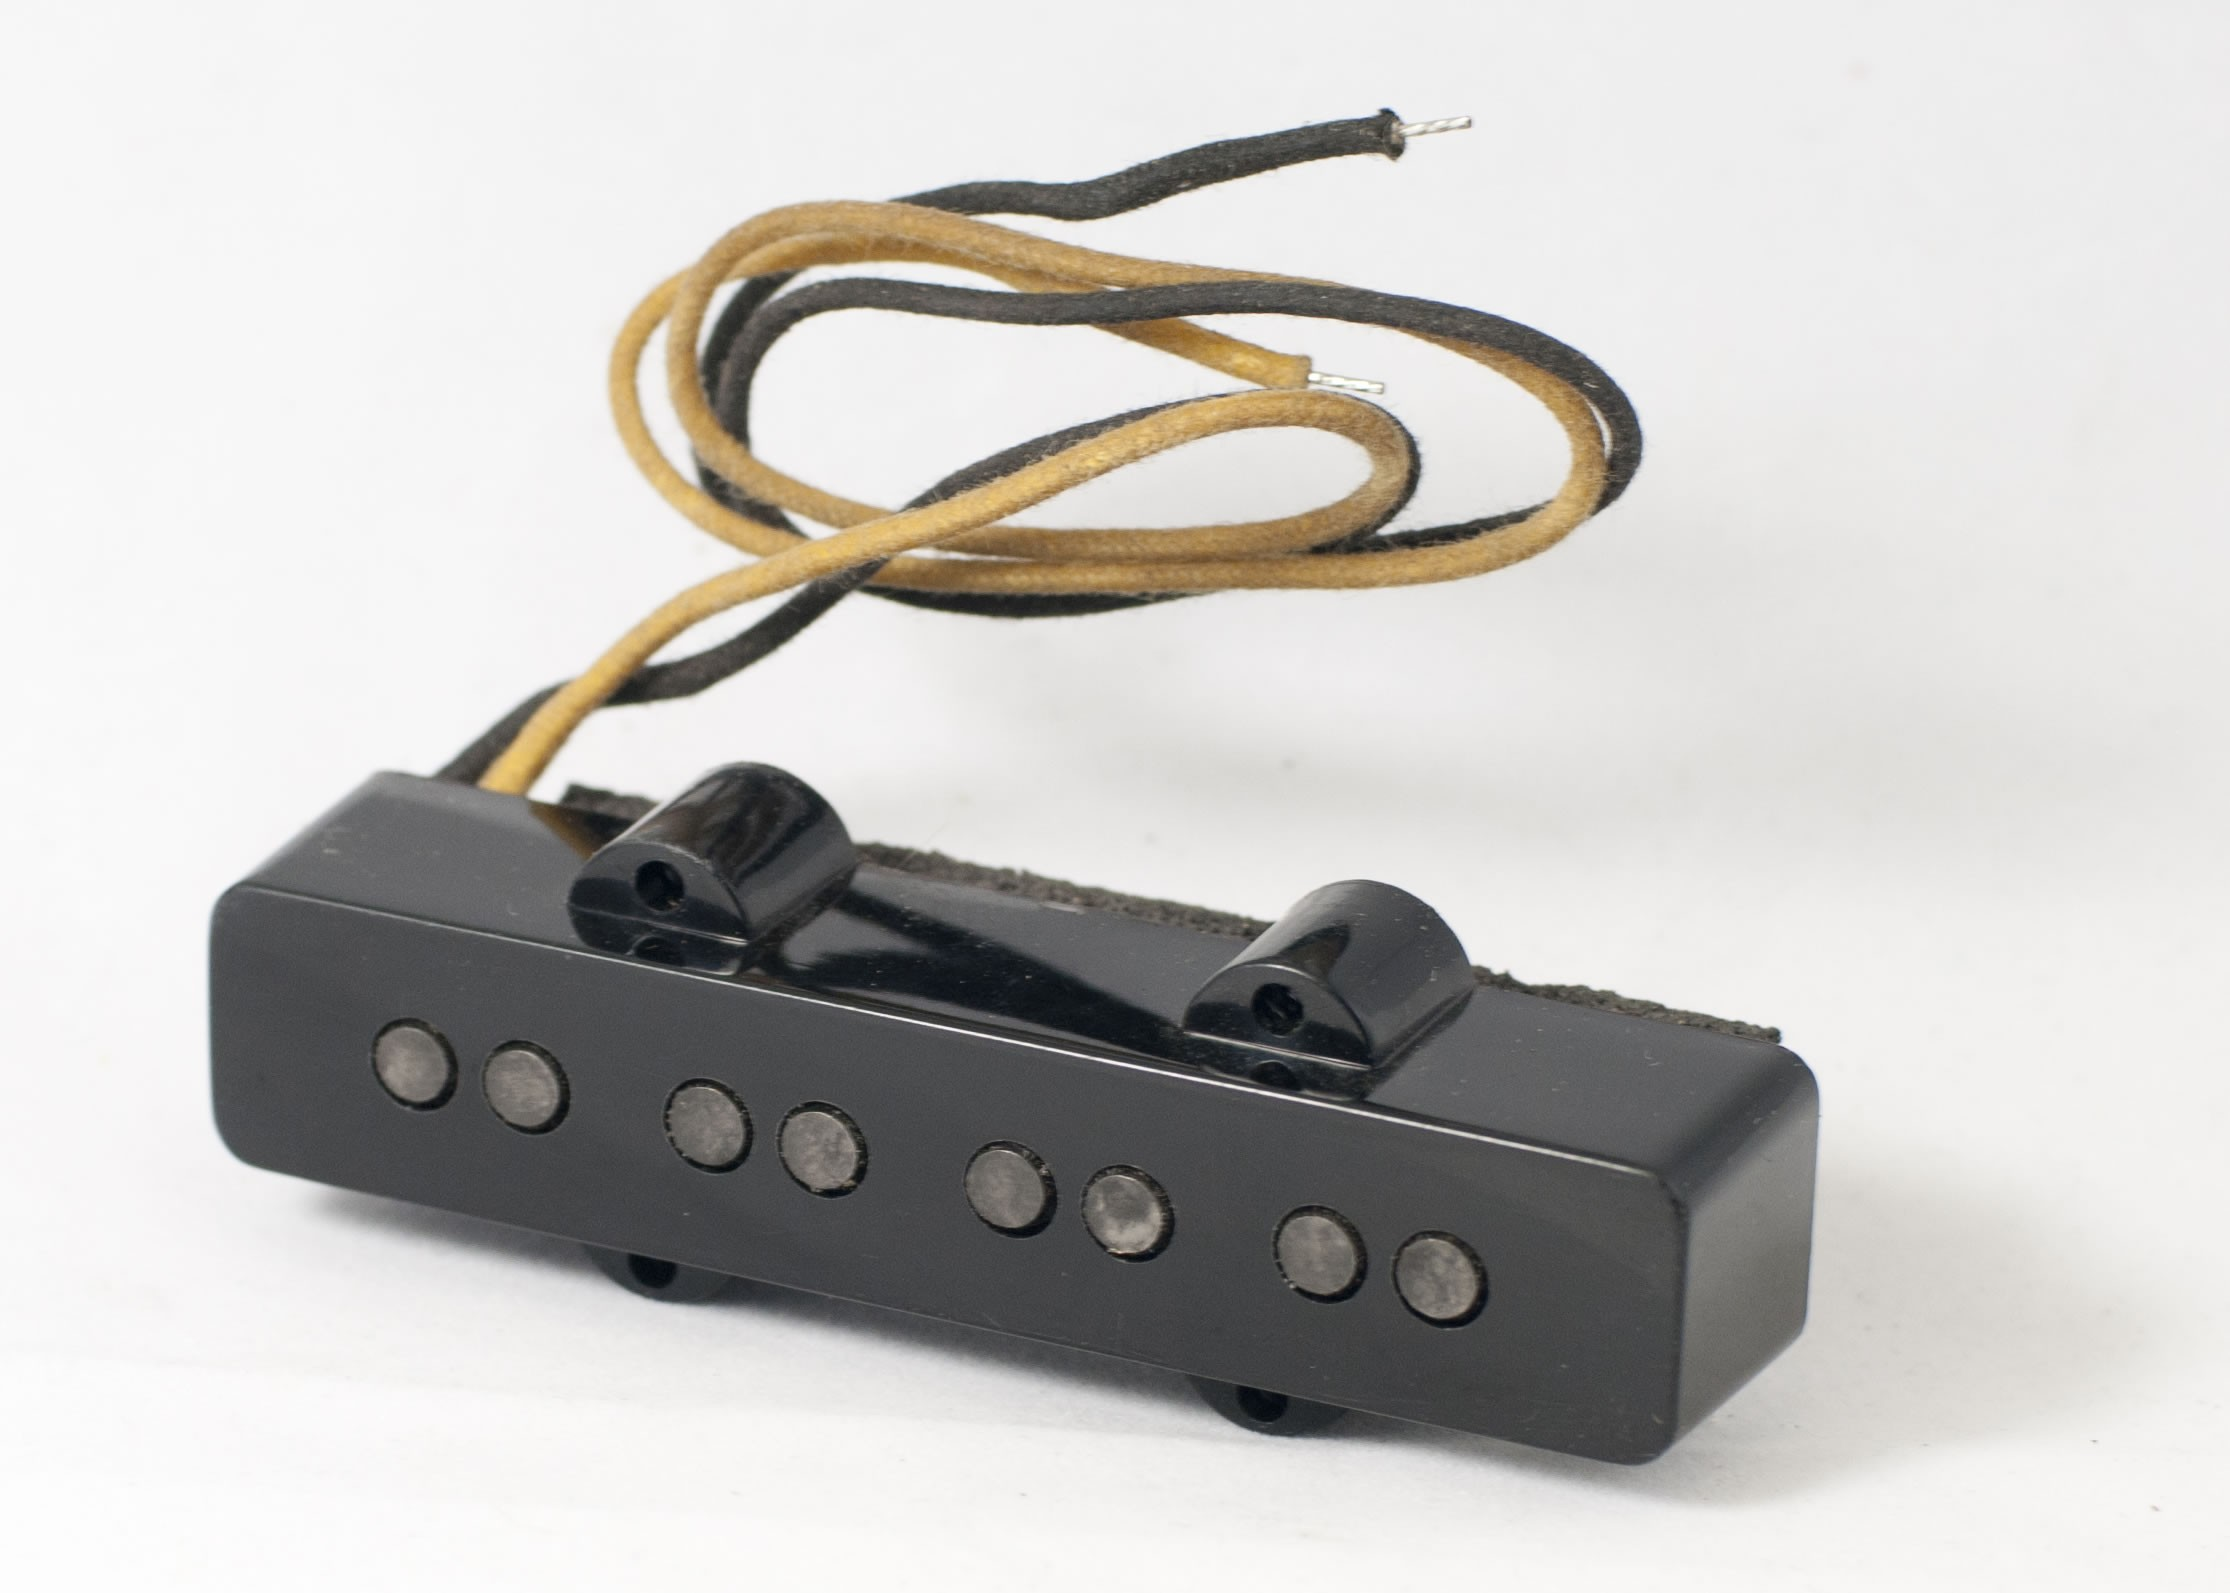 seymour duncan antiquity 1 4 string jazz bass pickup neck only best bass gear. Black Bedroom Furniture Sets. Home Design Ideas